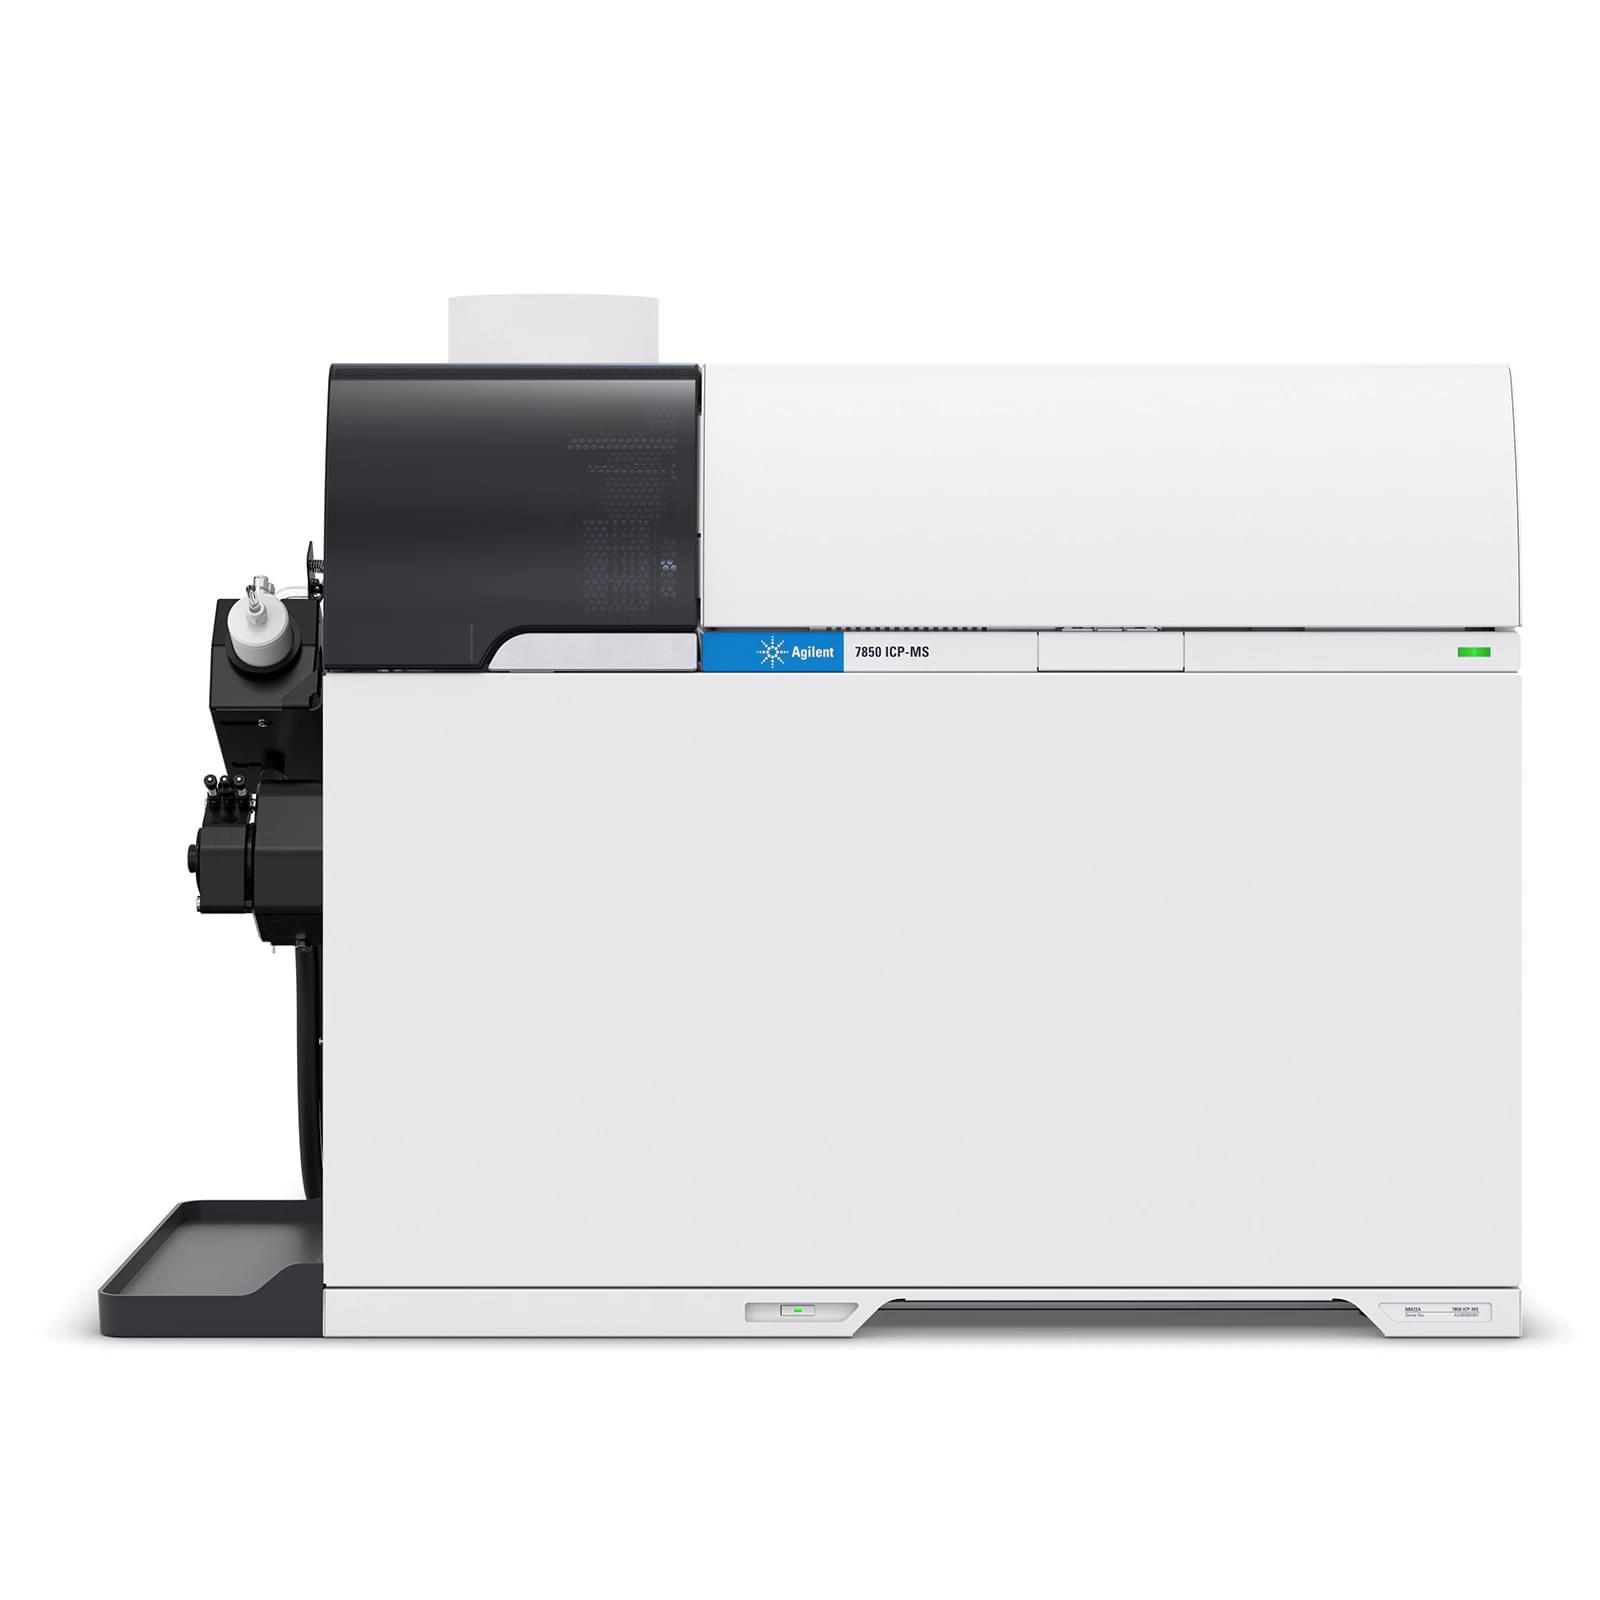 ICP-MS System